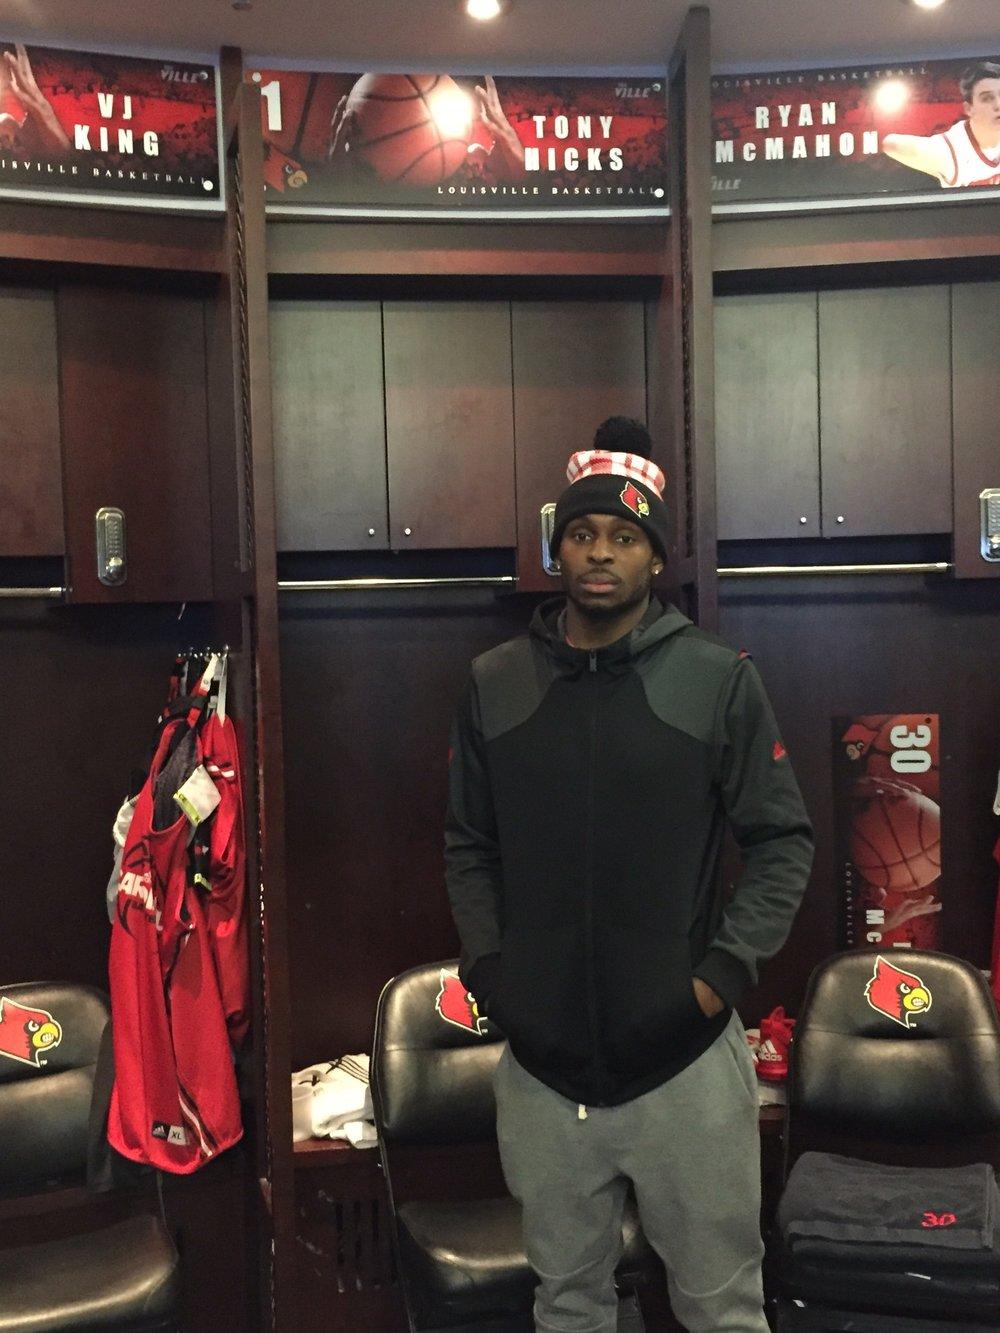 Ritaman and University of Louisville Cardinal Basketball Player Tony Hicks '12